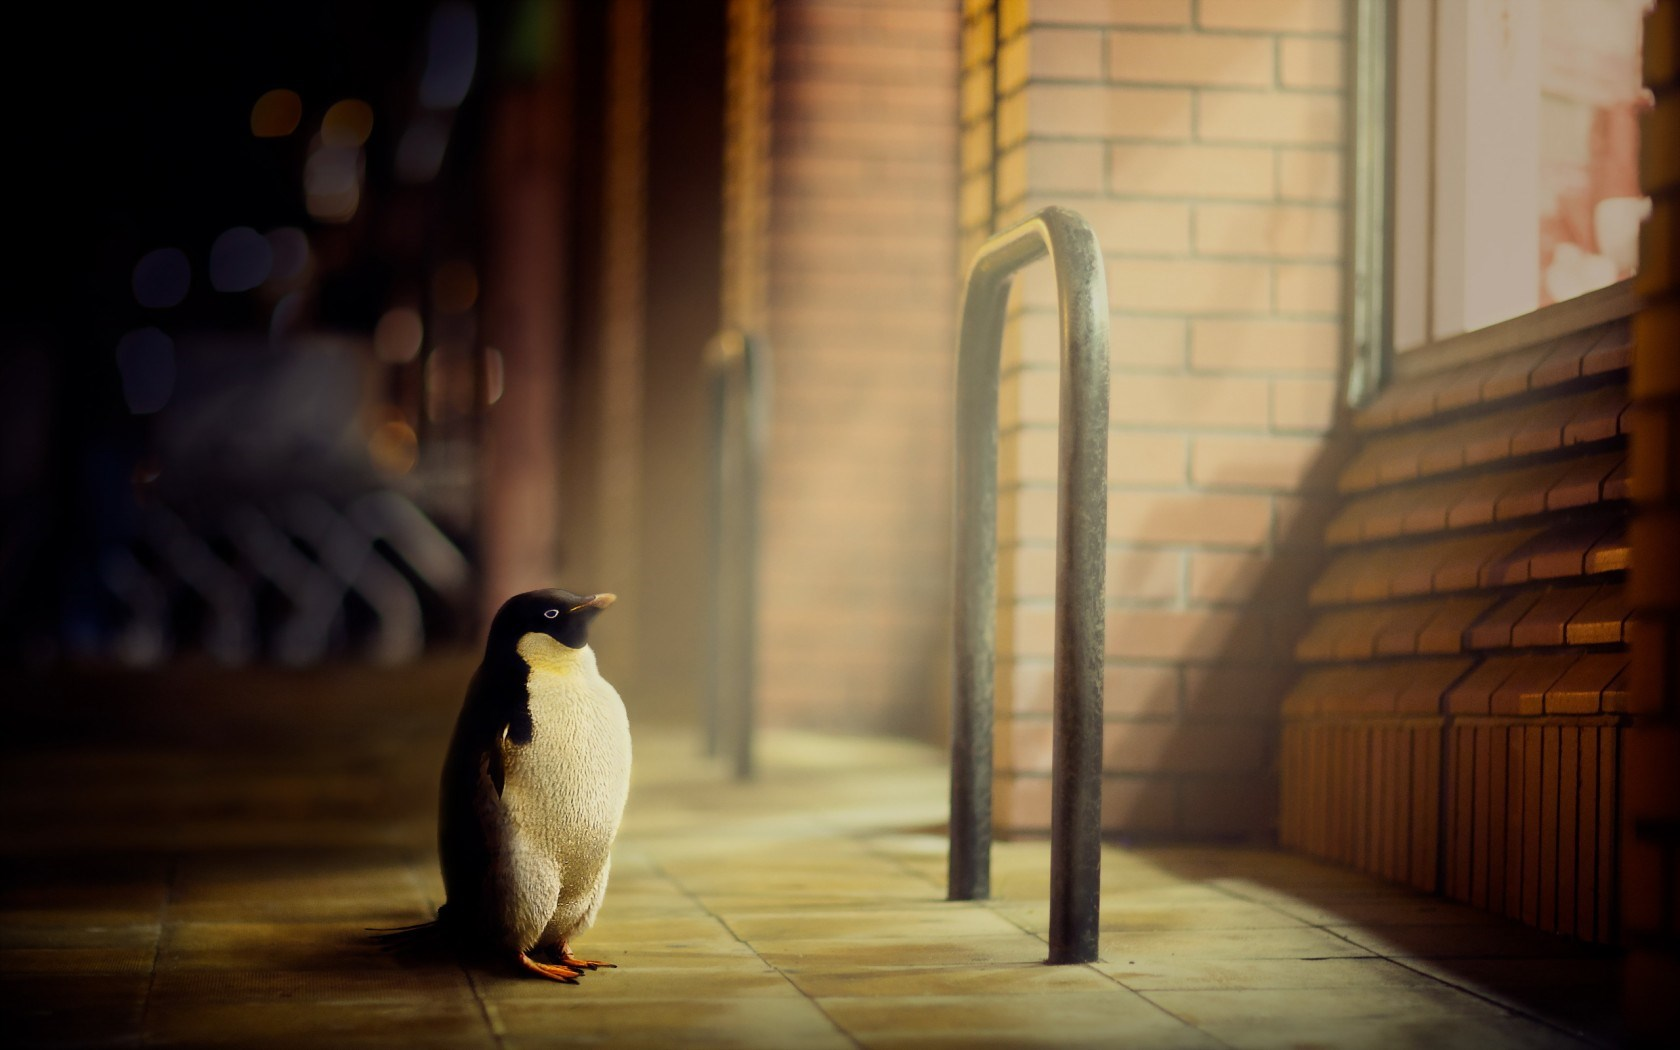 penguin wallpaper abstract